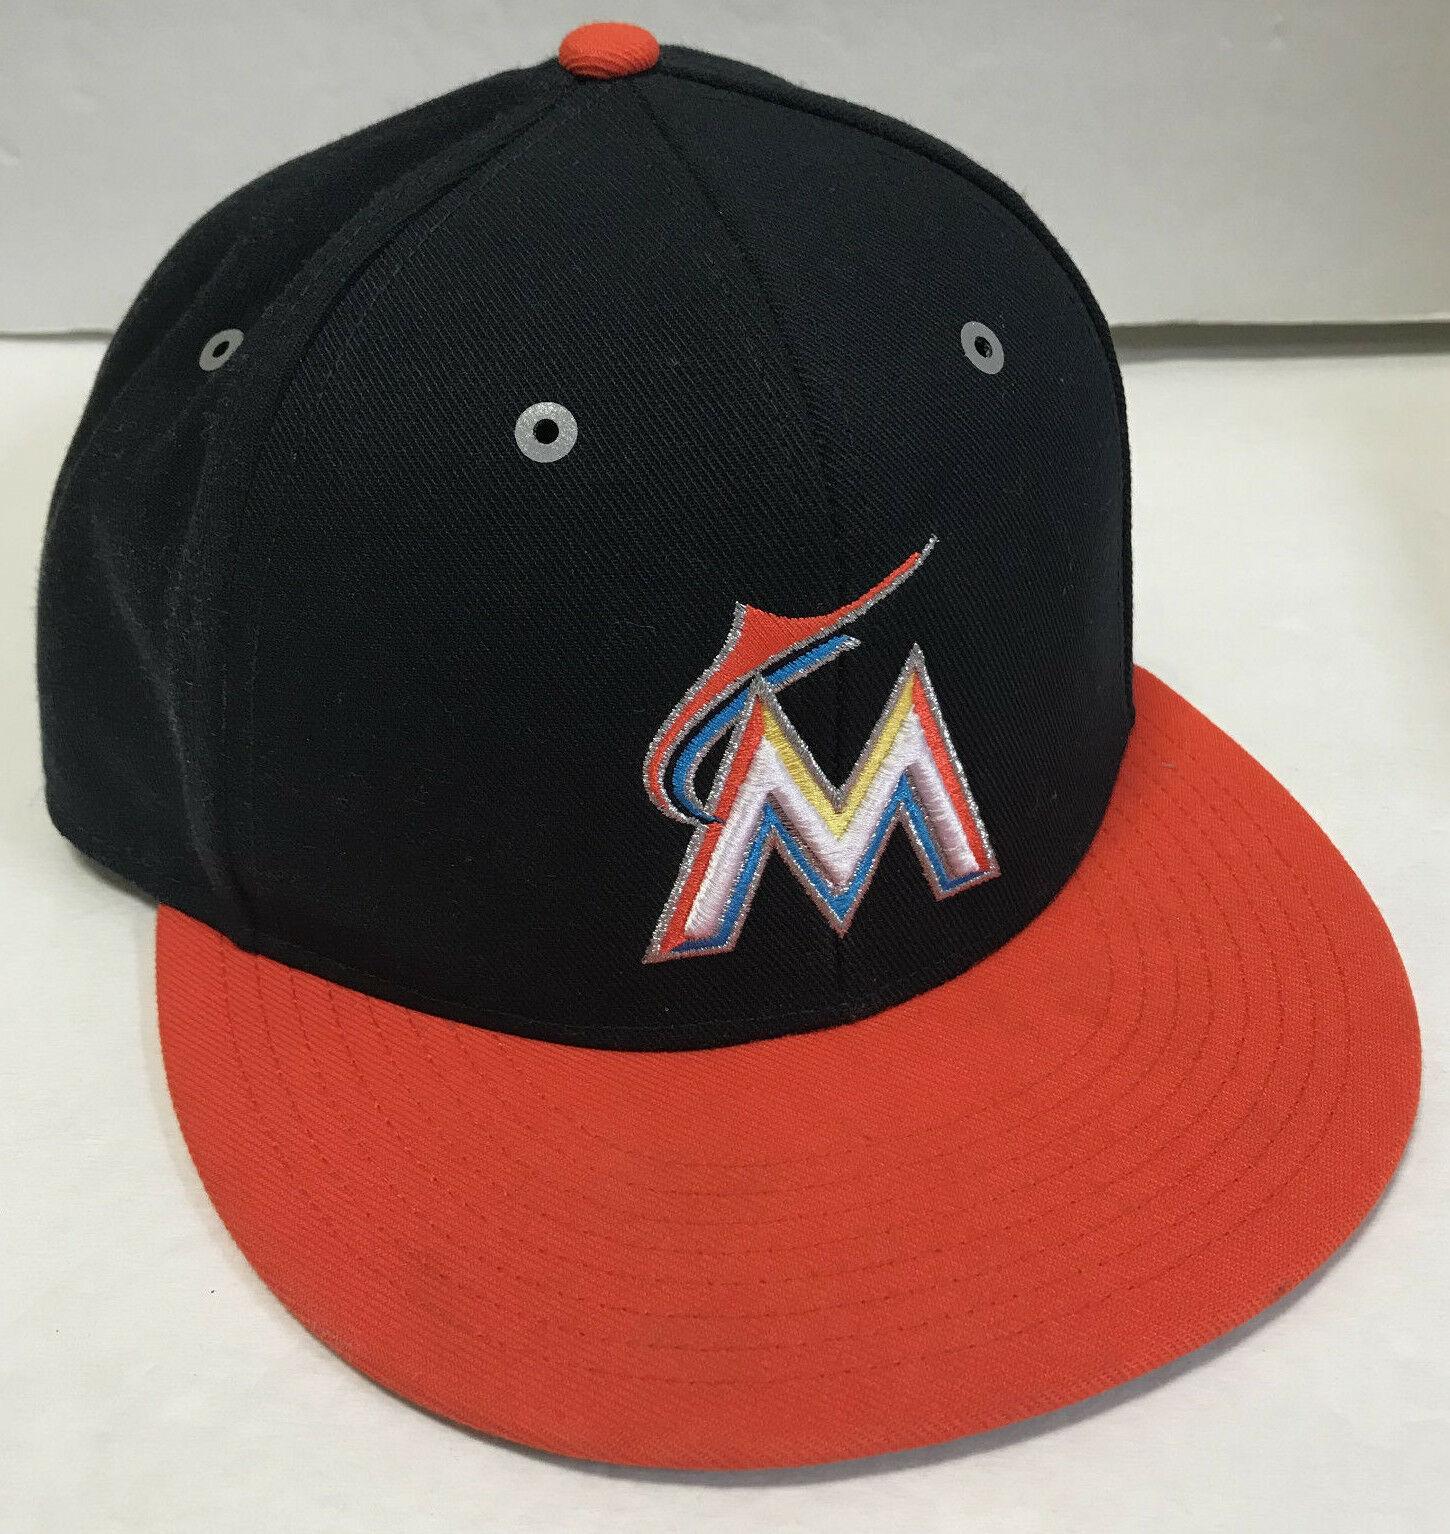 Nike Florida Marlins Adjustable Hat Baseball Cap Black Orange Flat Brim